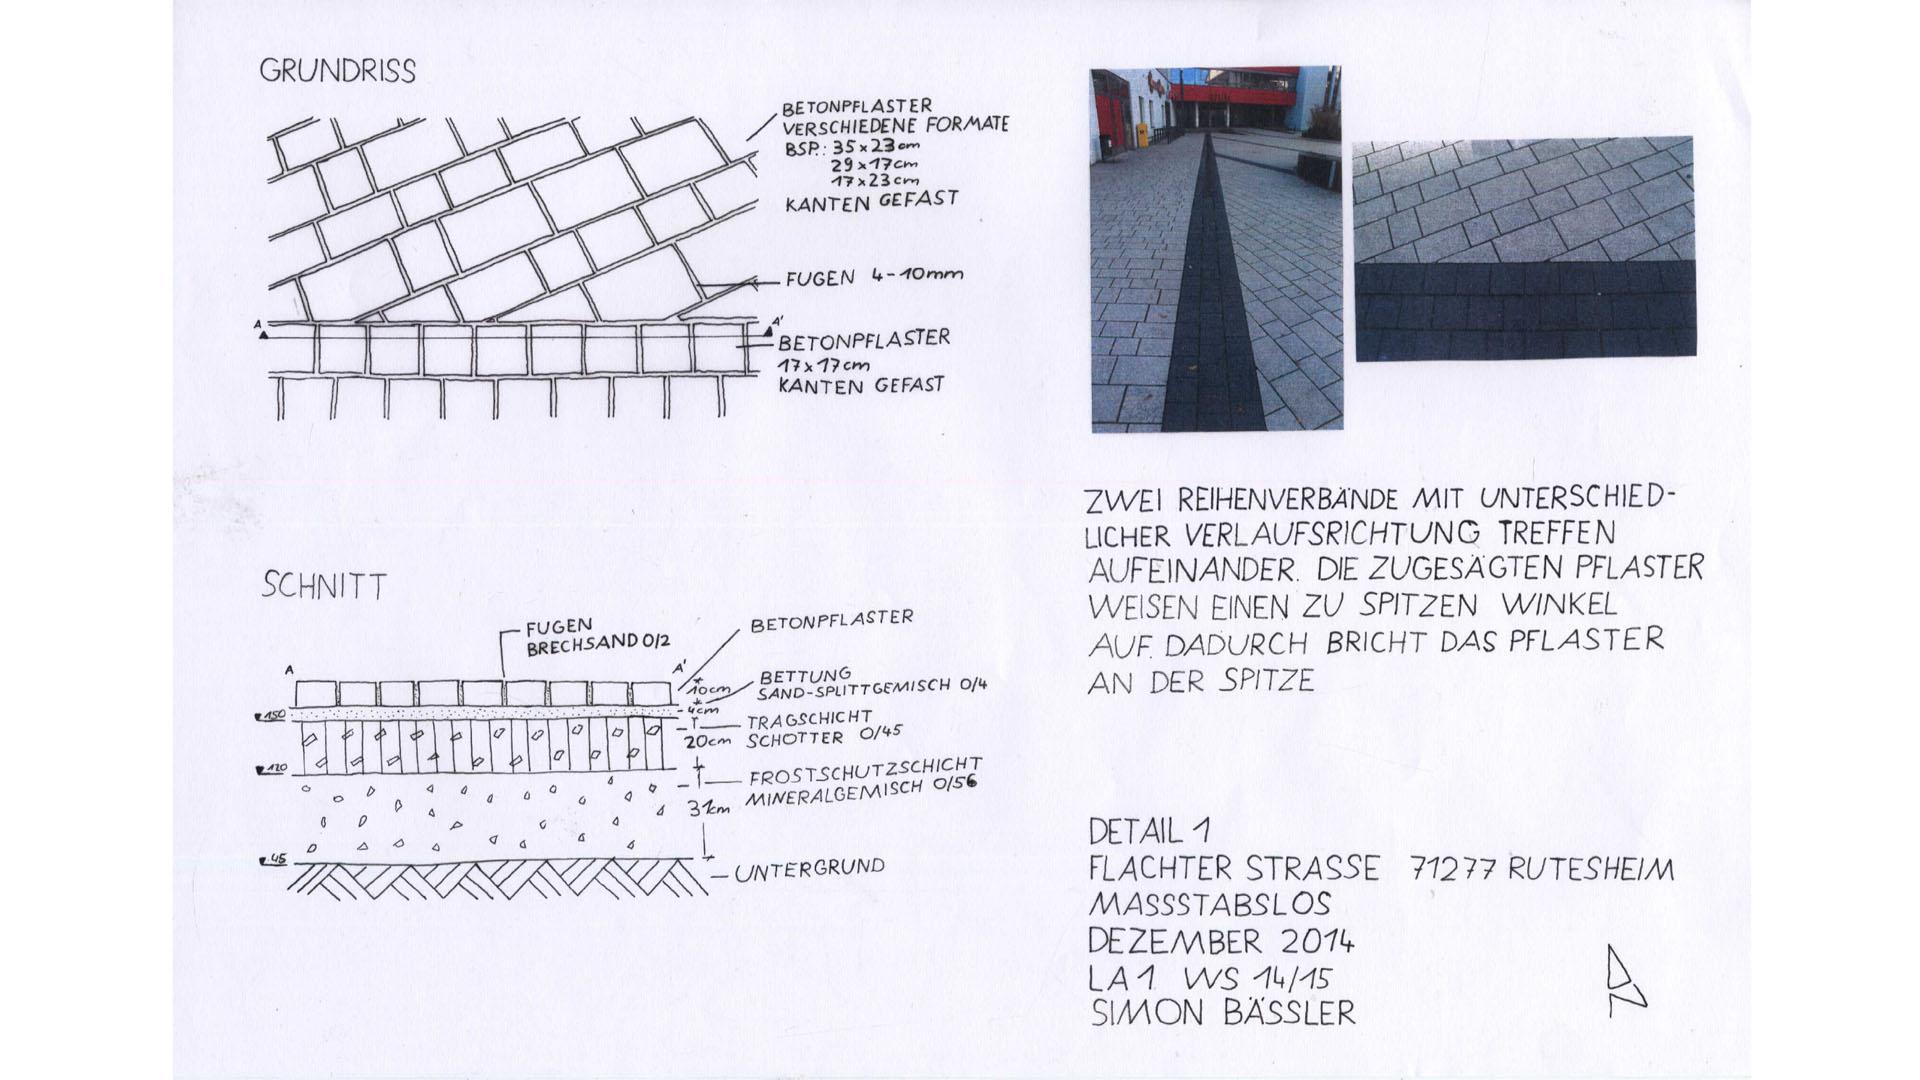 14 1 Baukonstruktion 02